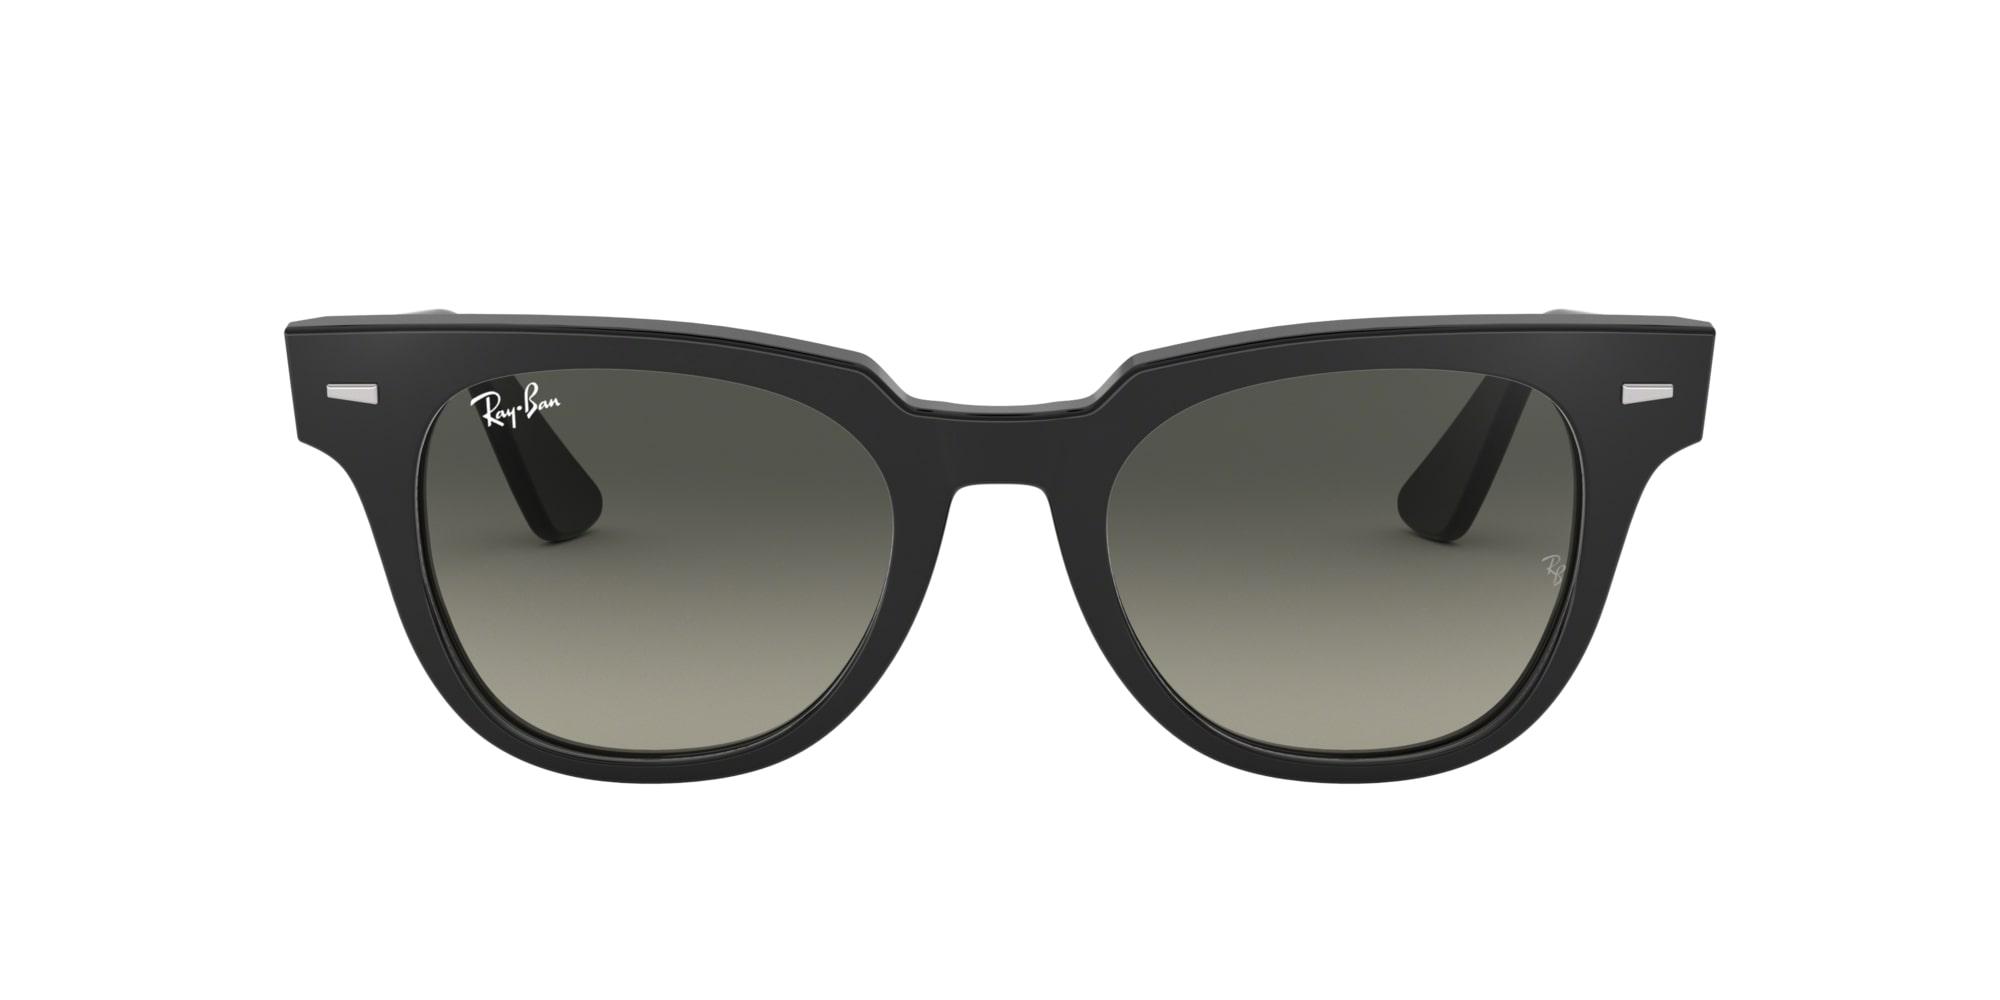 Ray Ban Meteor Classic solbriller, black/grey gradient